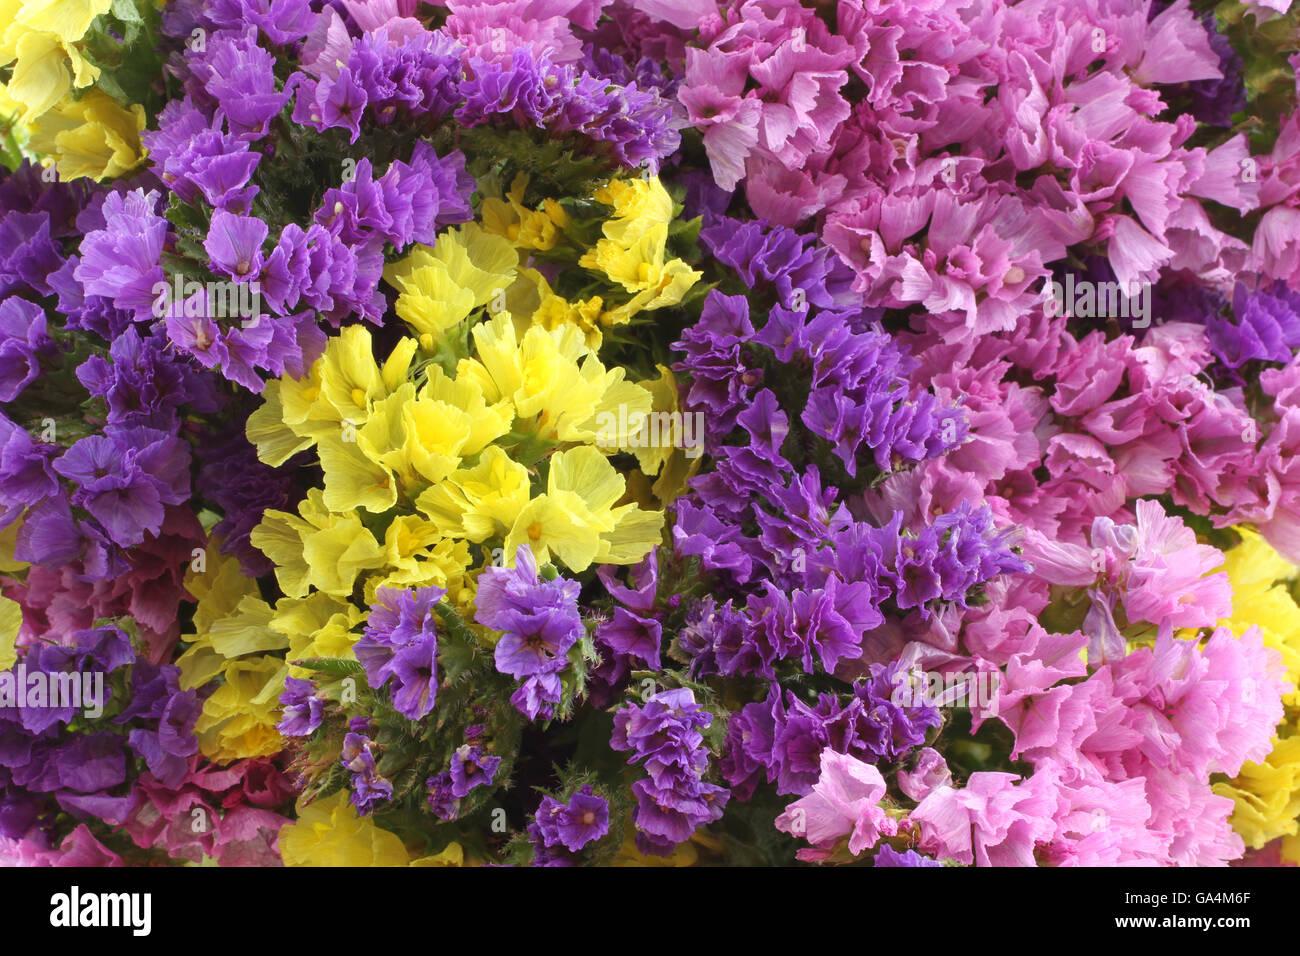 pink purple yellow statice flowers limonium background stock